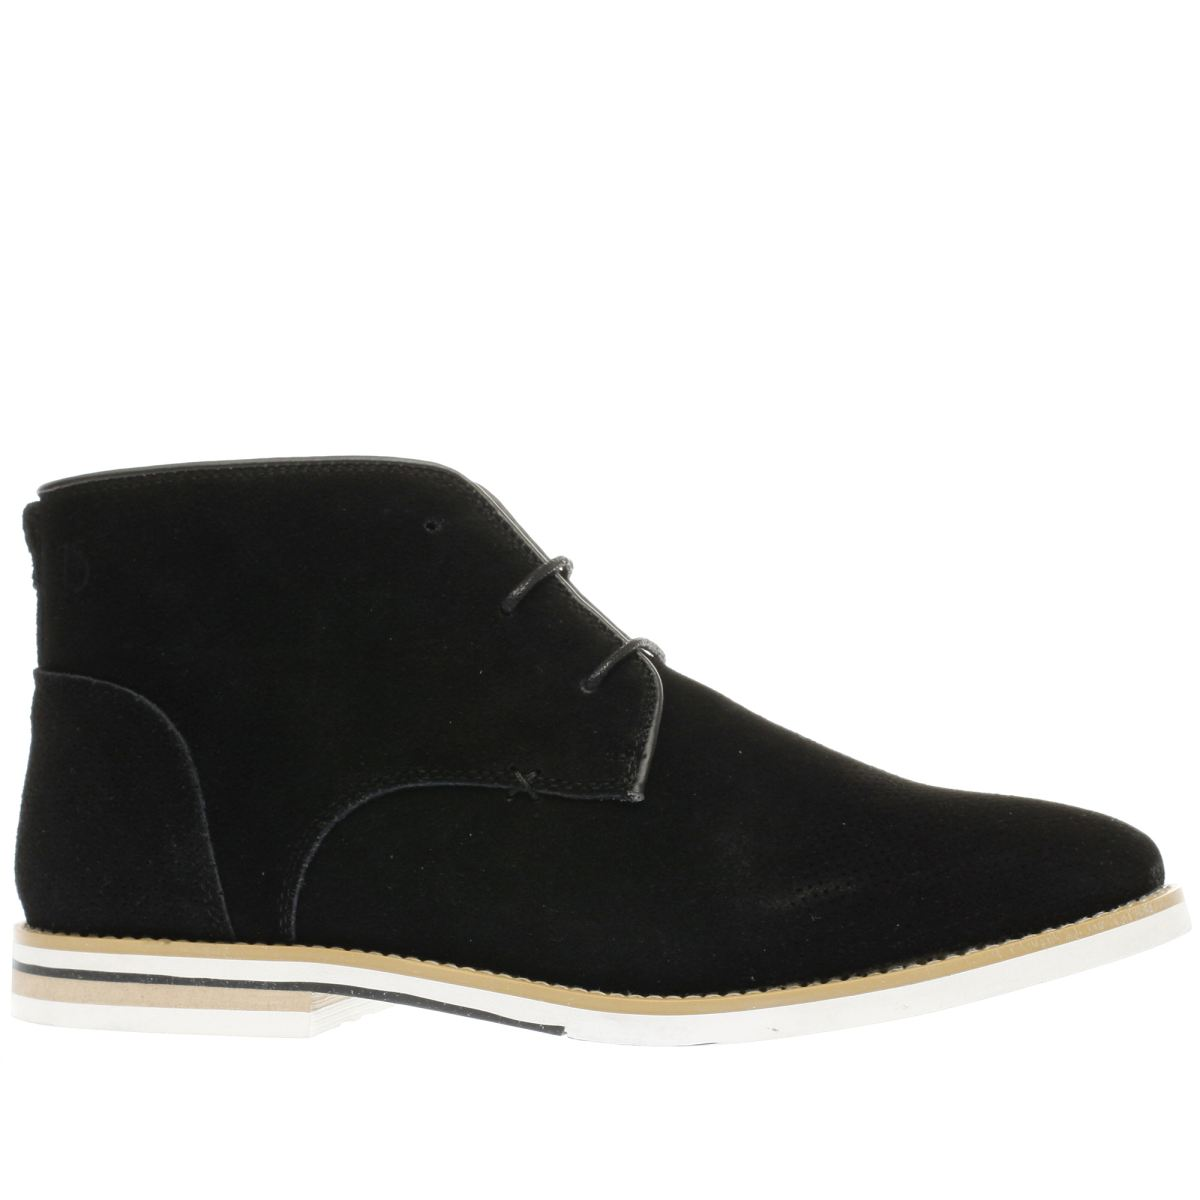 peter werth black nesbit chukka perf boots